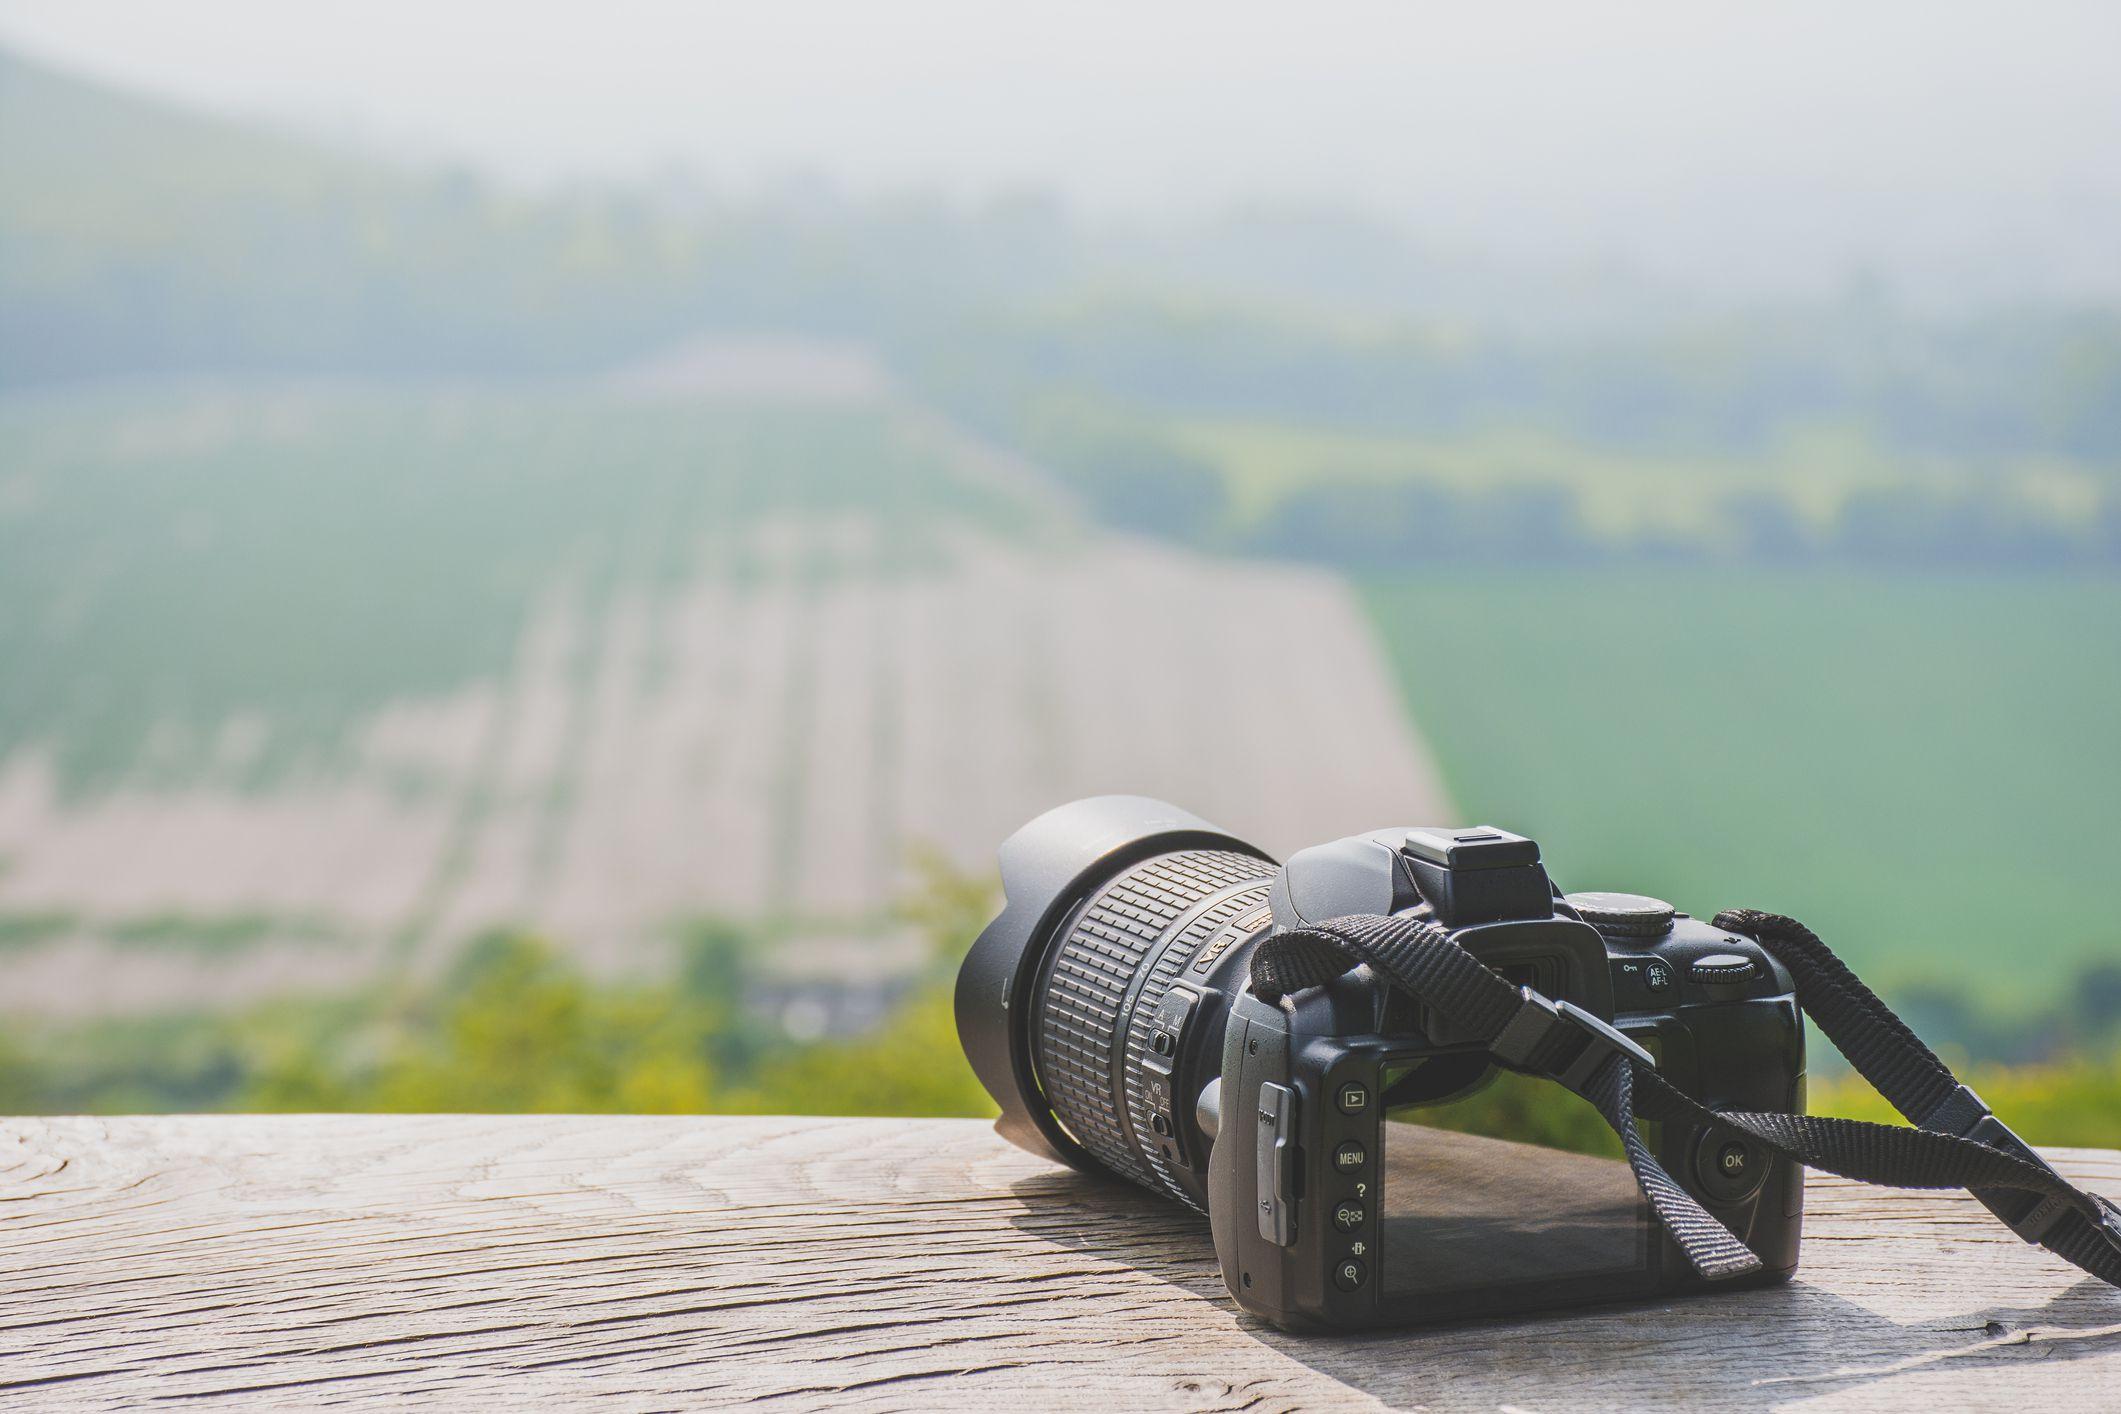 Photography Basics: Cameras, Exposure, and Lighting